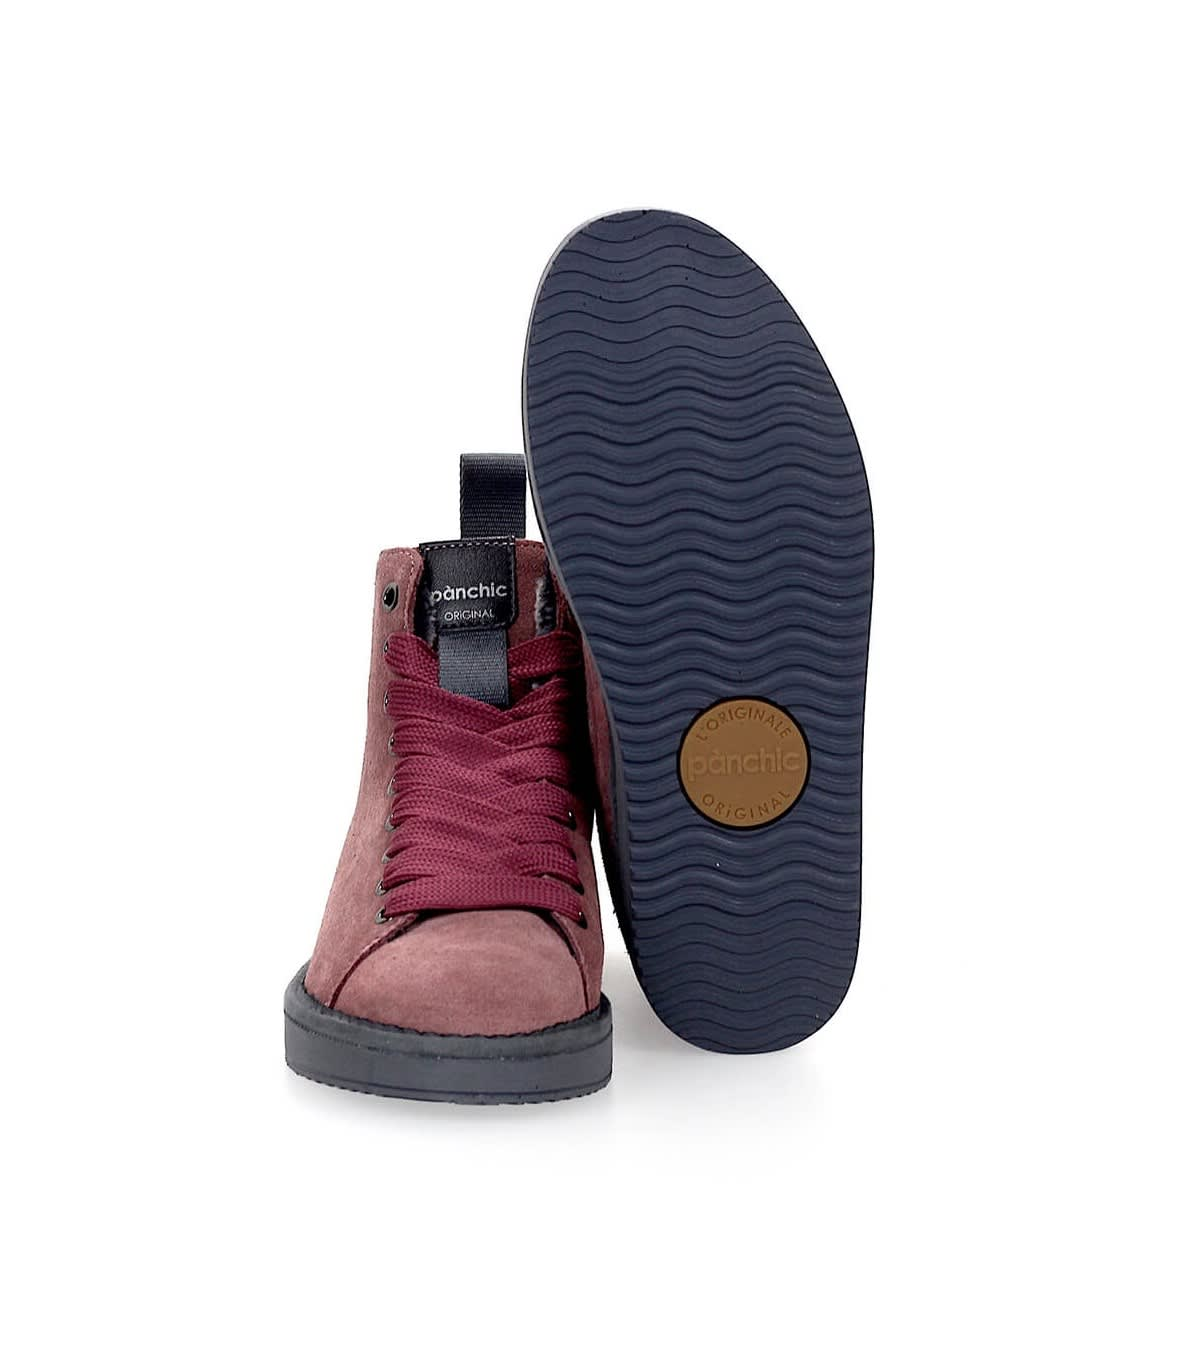 Panchic Pànchic Dark Pink Suède Roma W Brownrose Boot